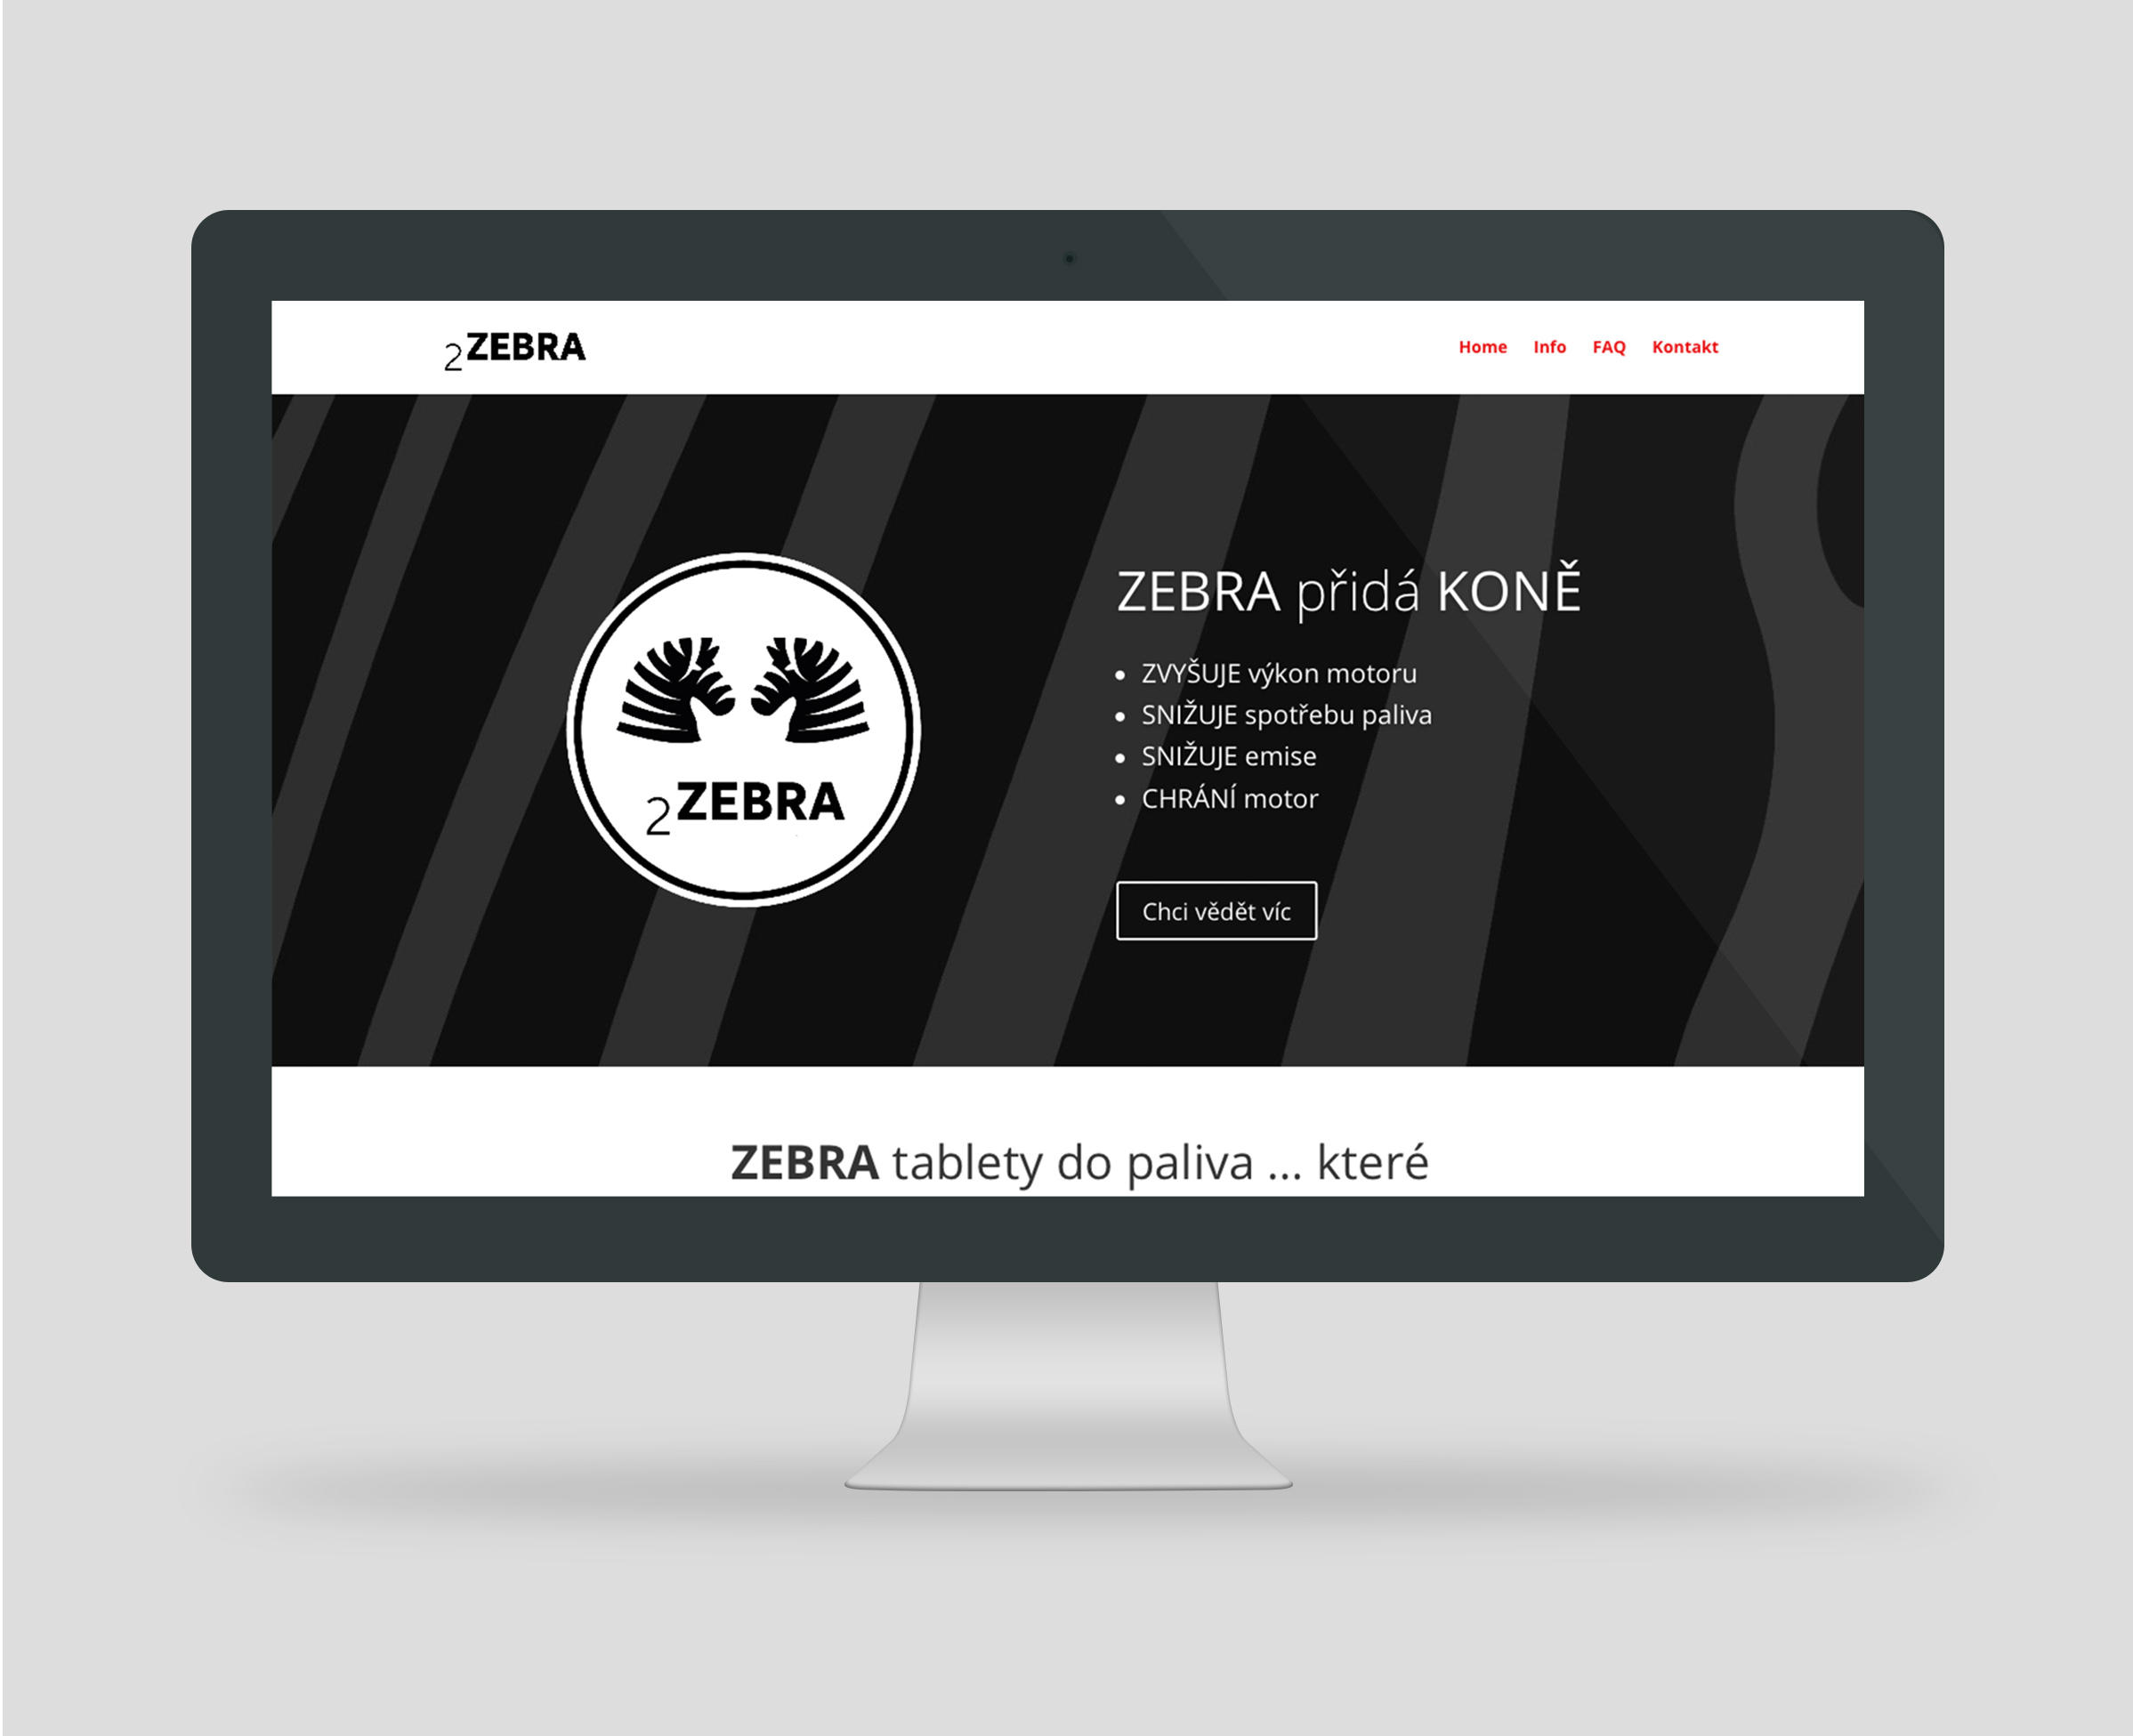 2zebra-web